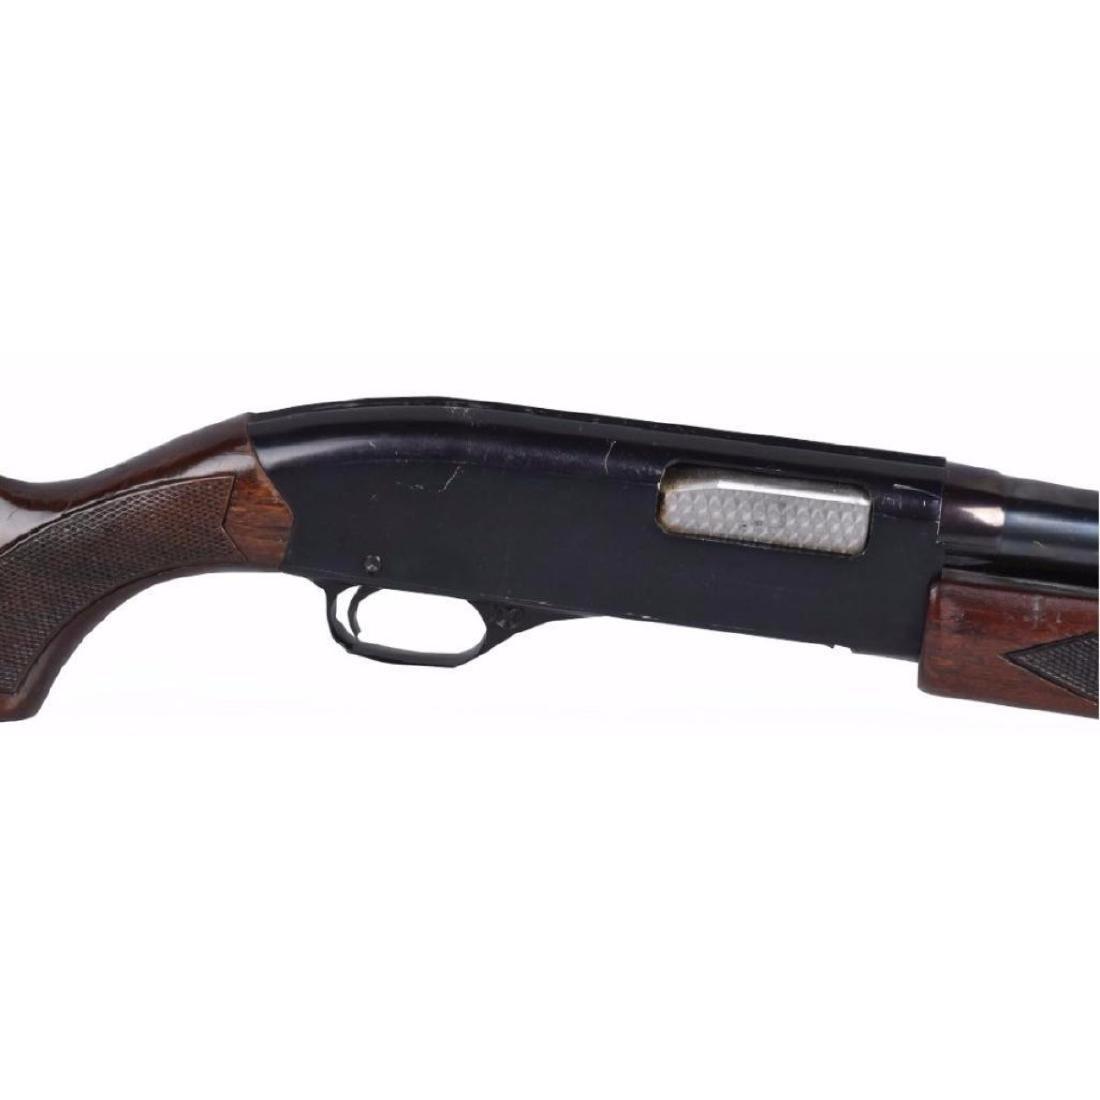 Winchester Model 1200 12 Ga Pump Shotgun - 5